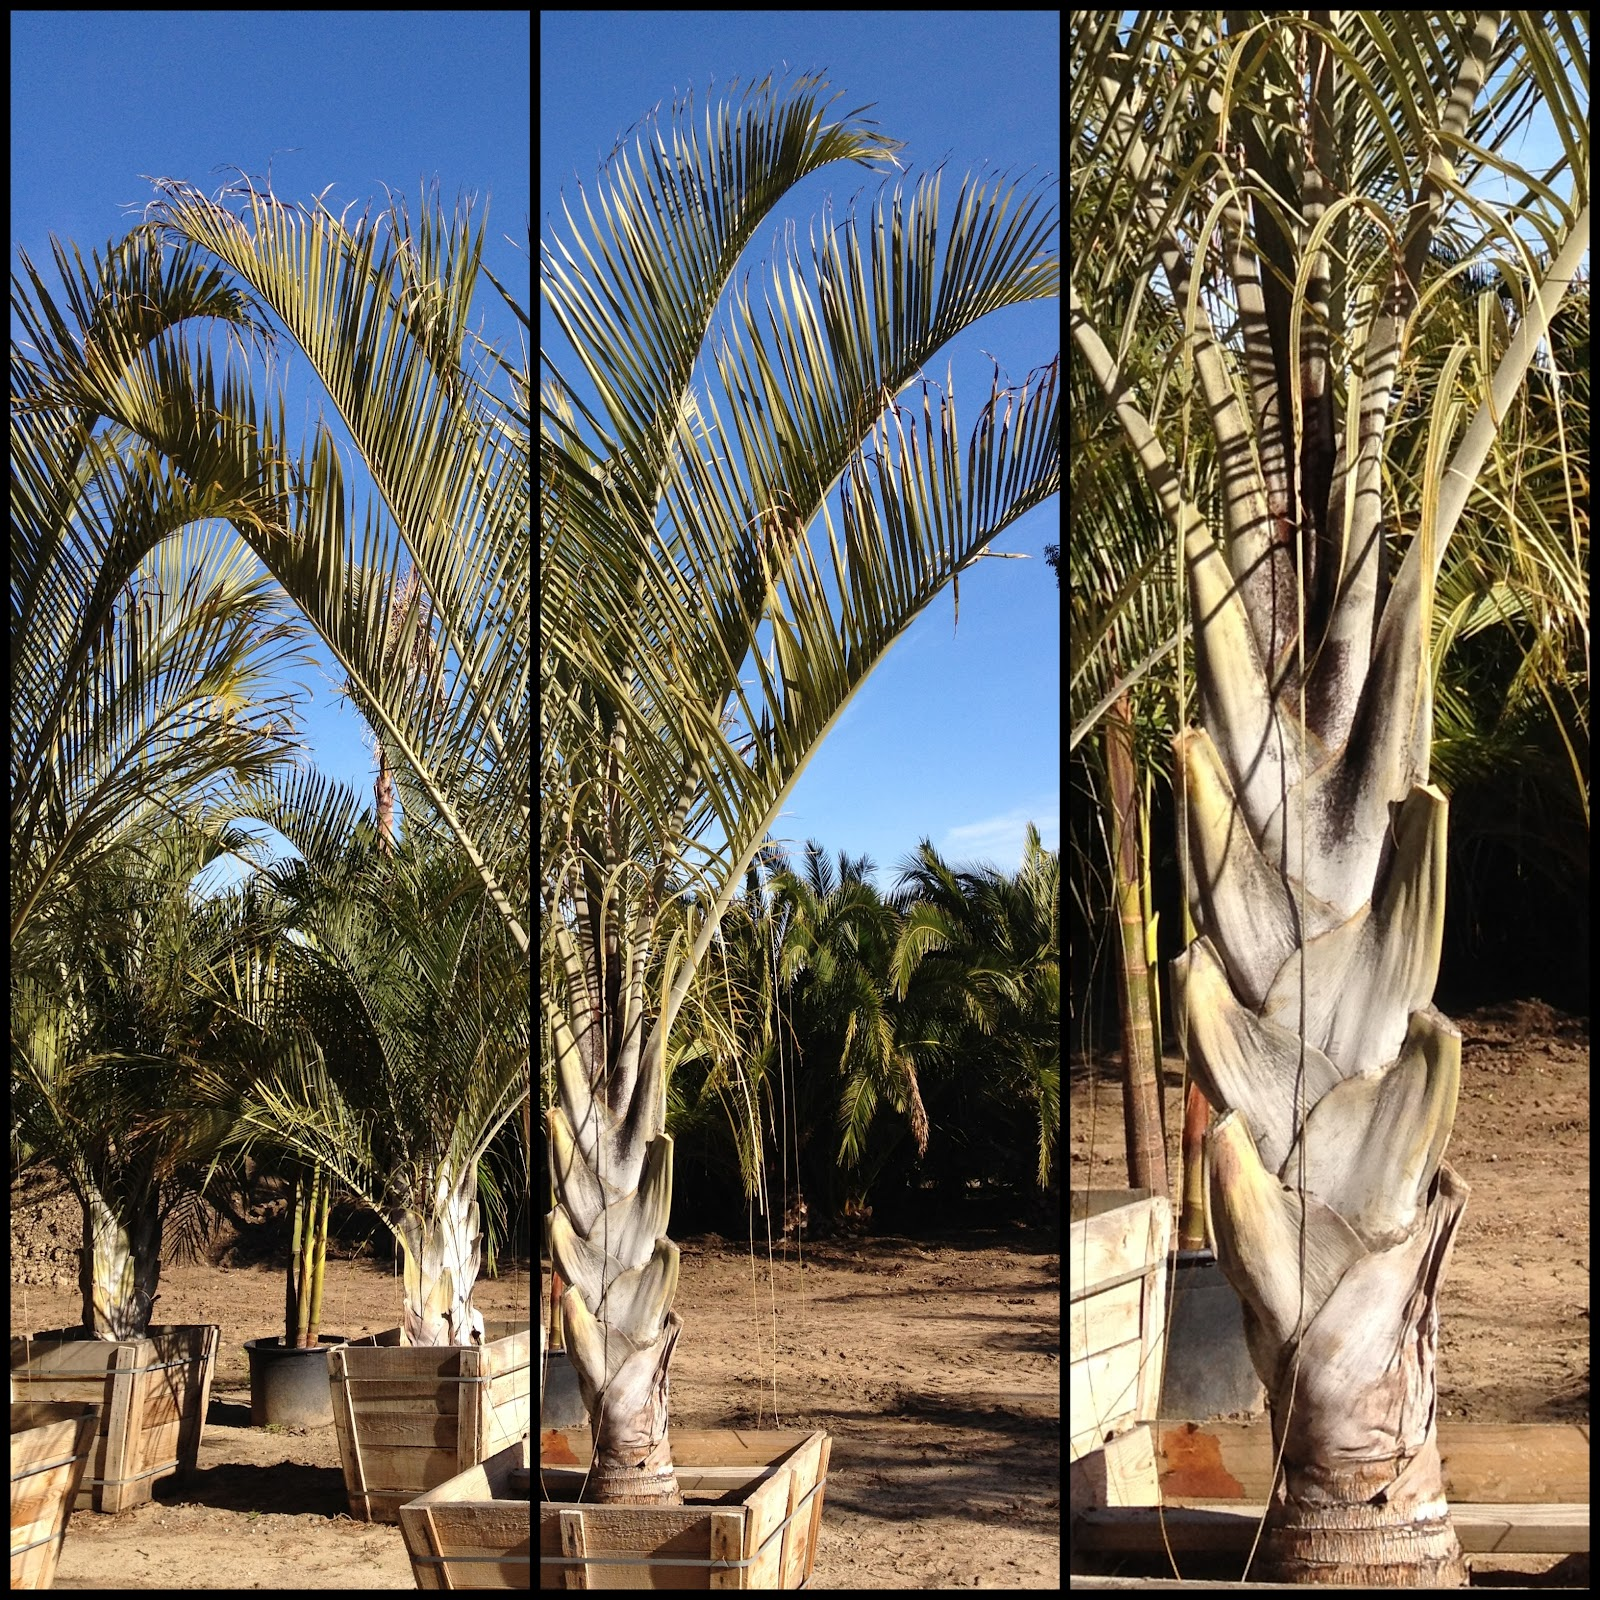 Gregory Palm Farms April 2012